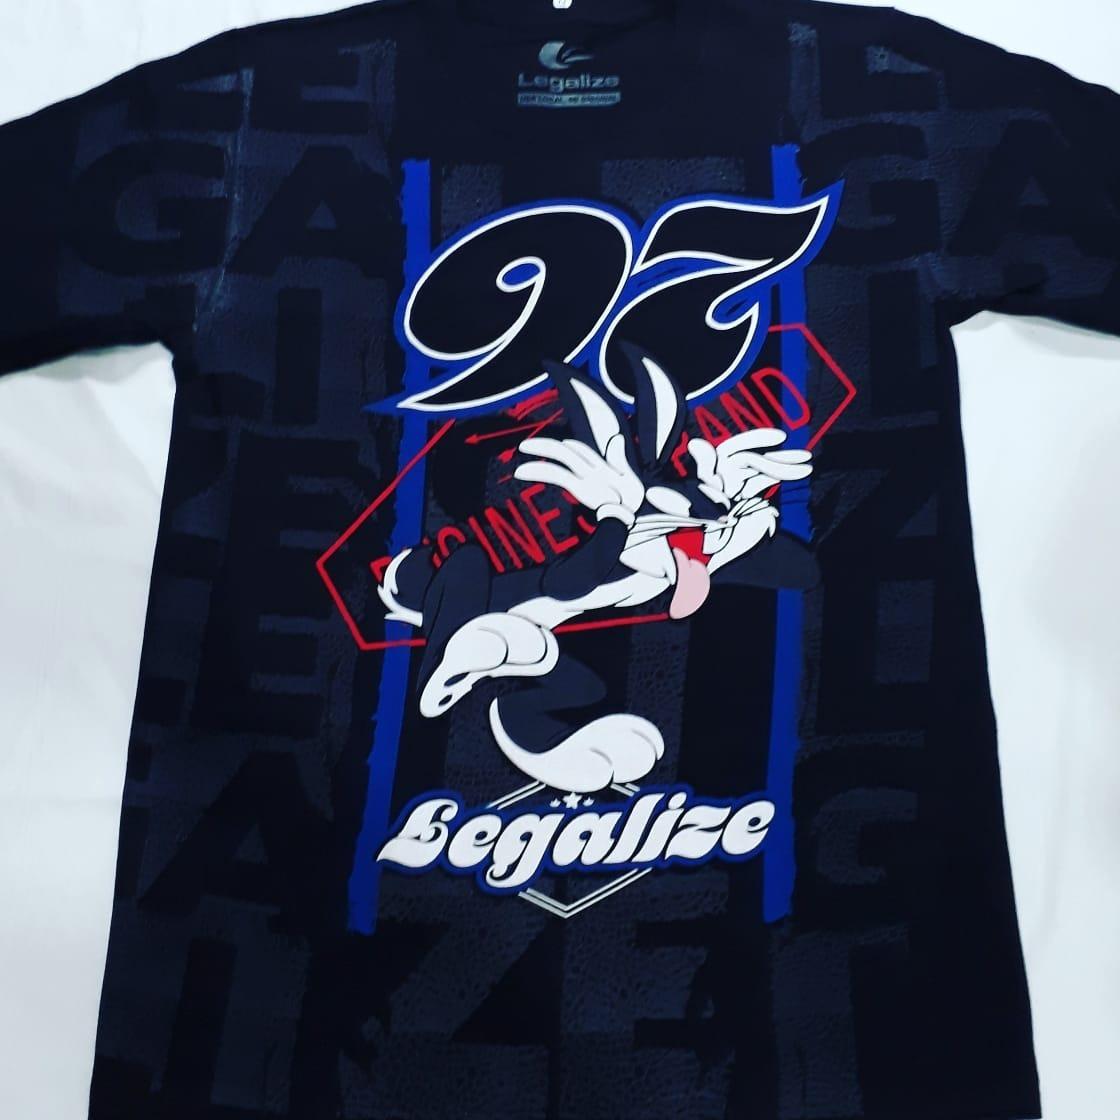 b87e7efc34d1c Camiseta hombre moda urbana ropa estilo hip hop street cargando zoom jpg  1120x1120 Hip hop ropa